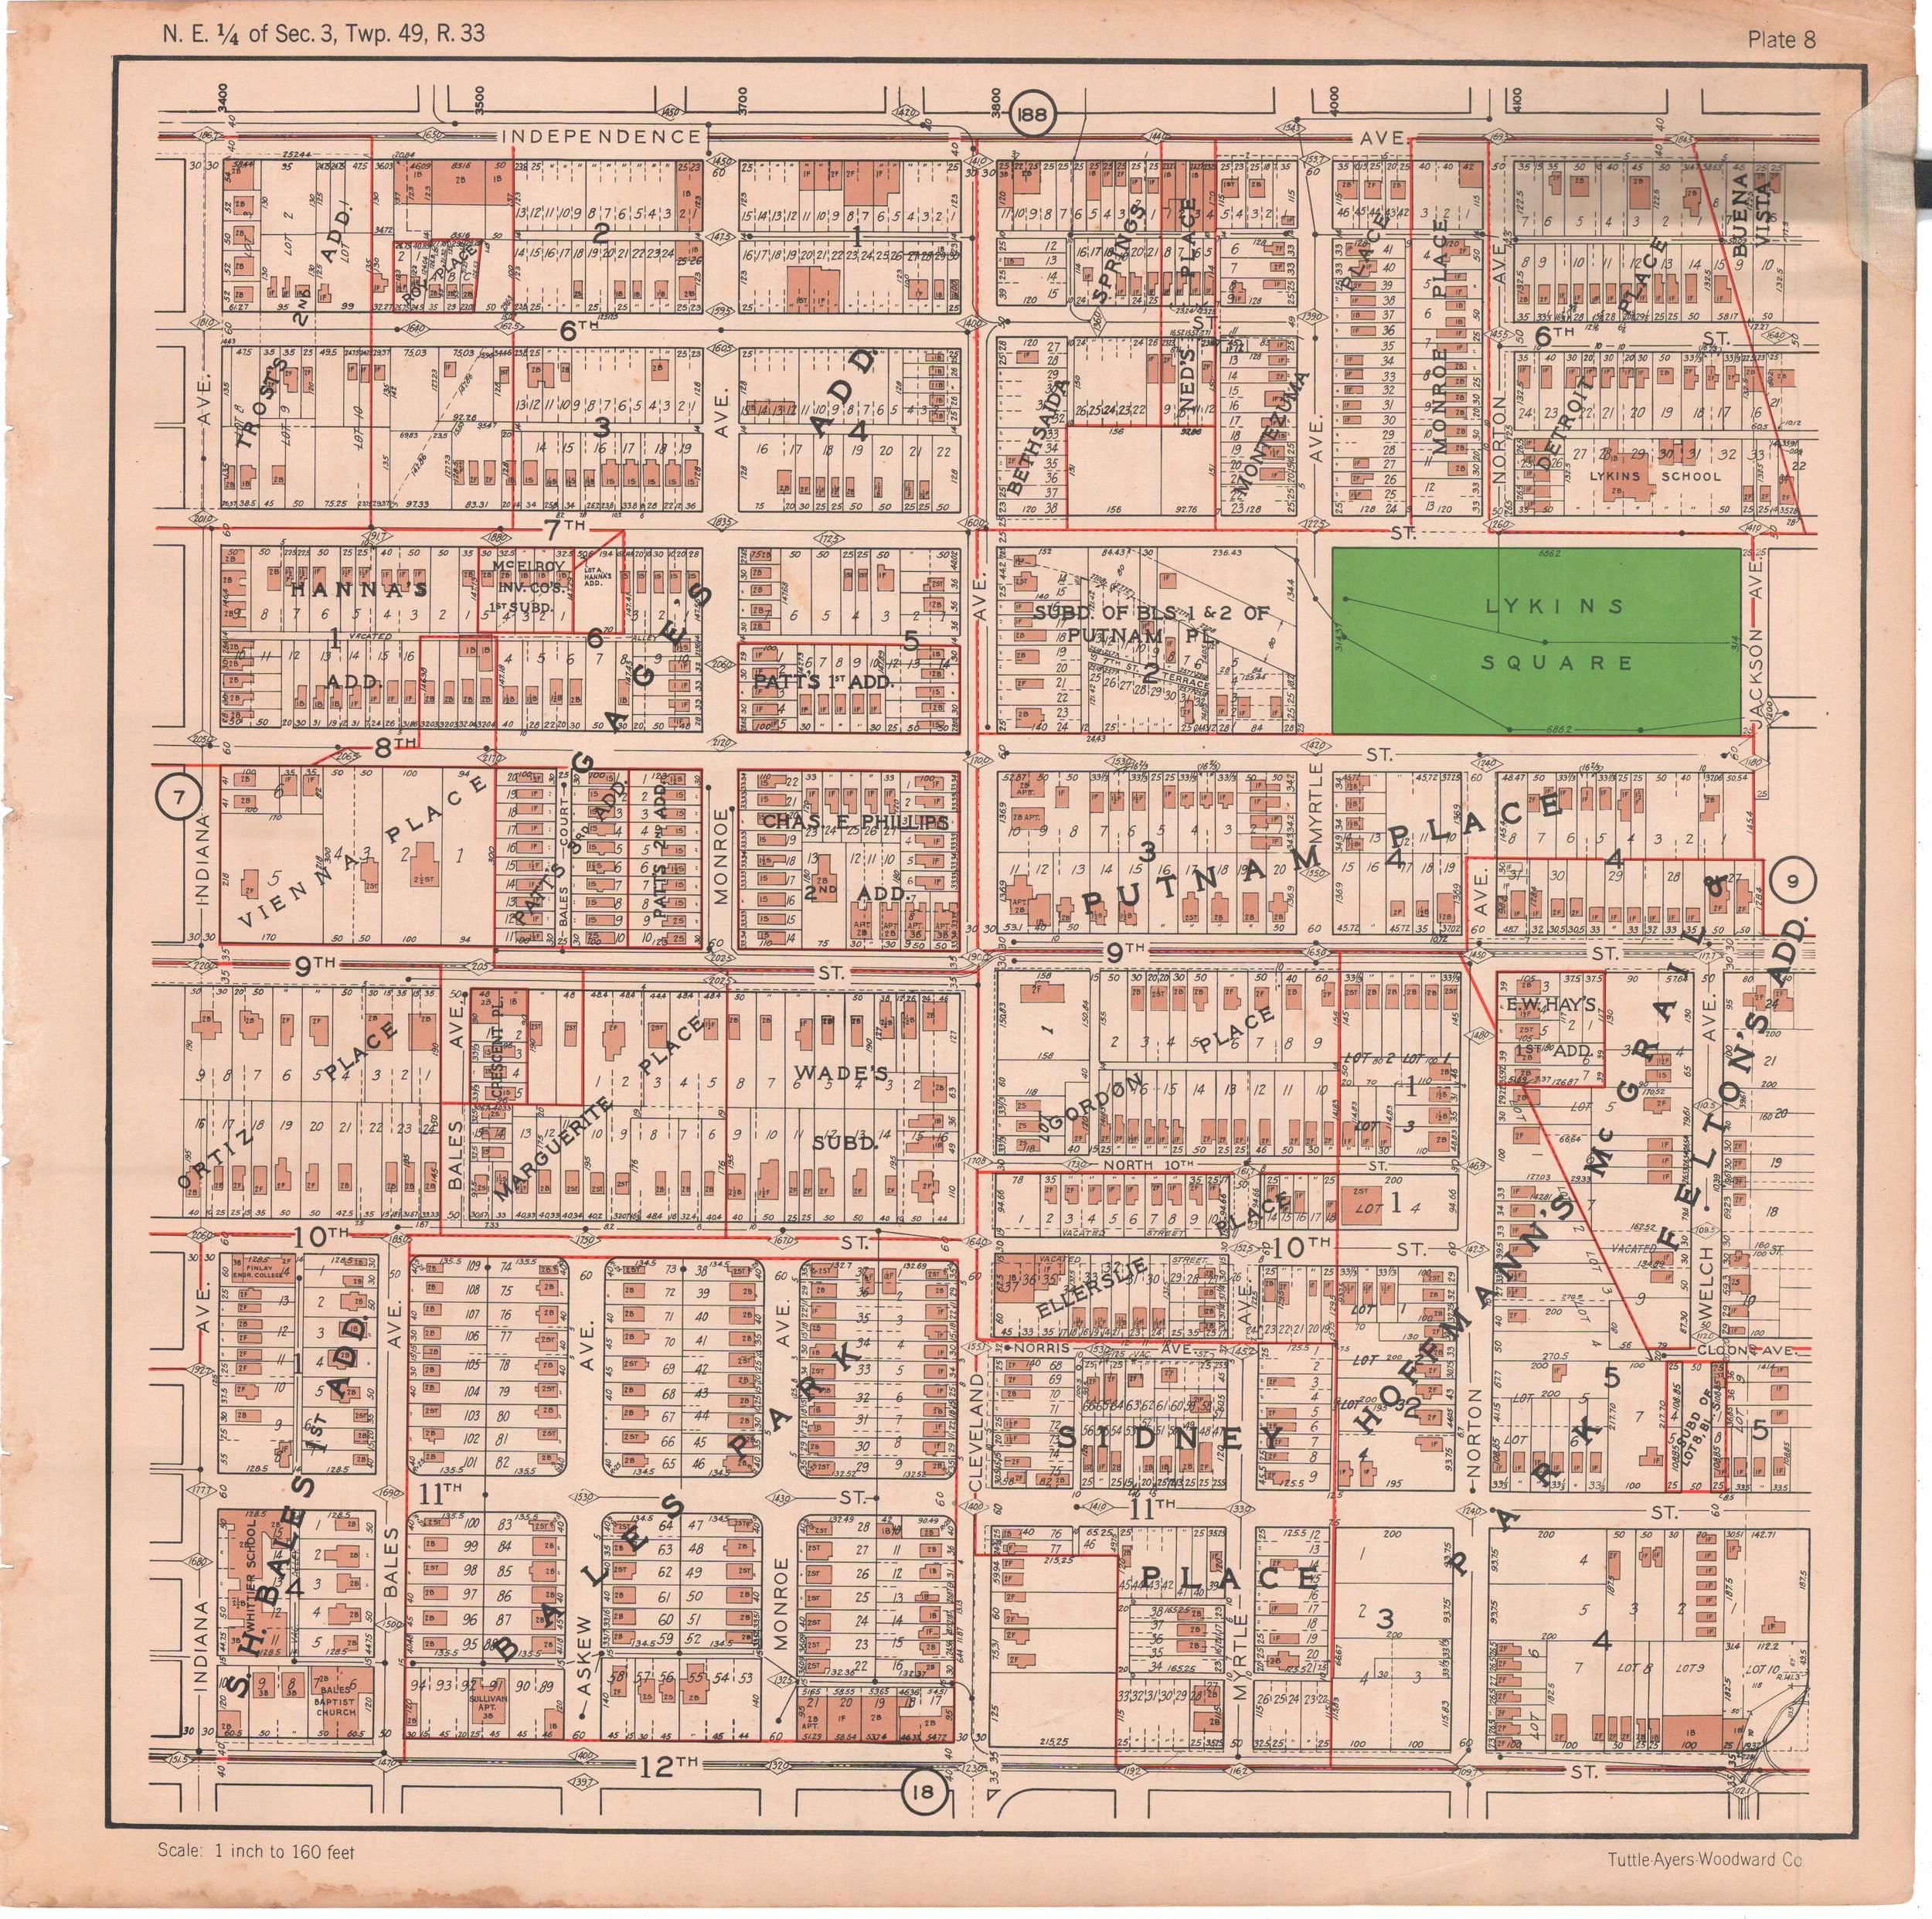 1925 TUTTLE_AYERS_Plate 8.JPG